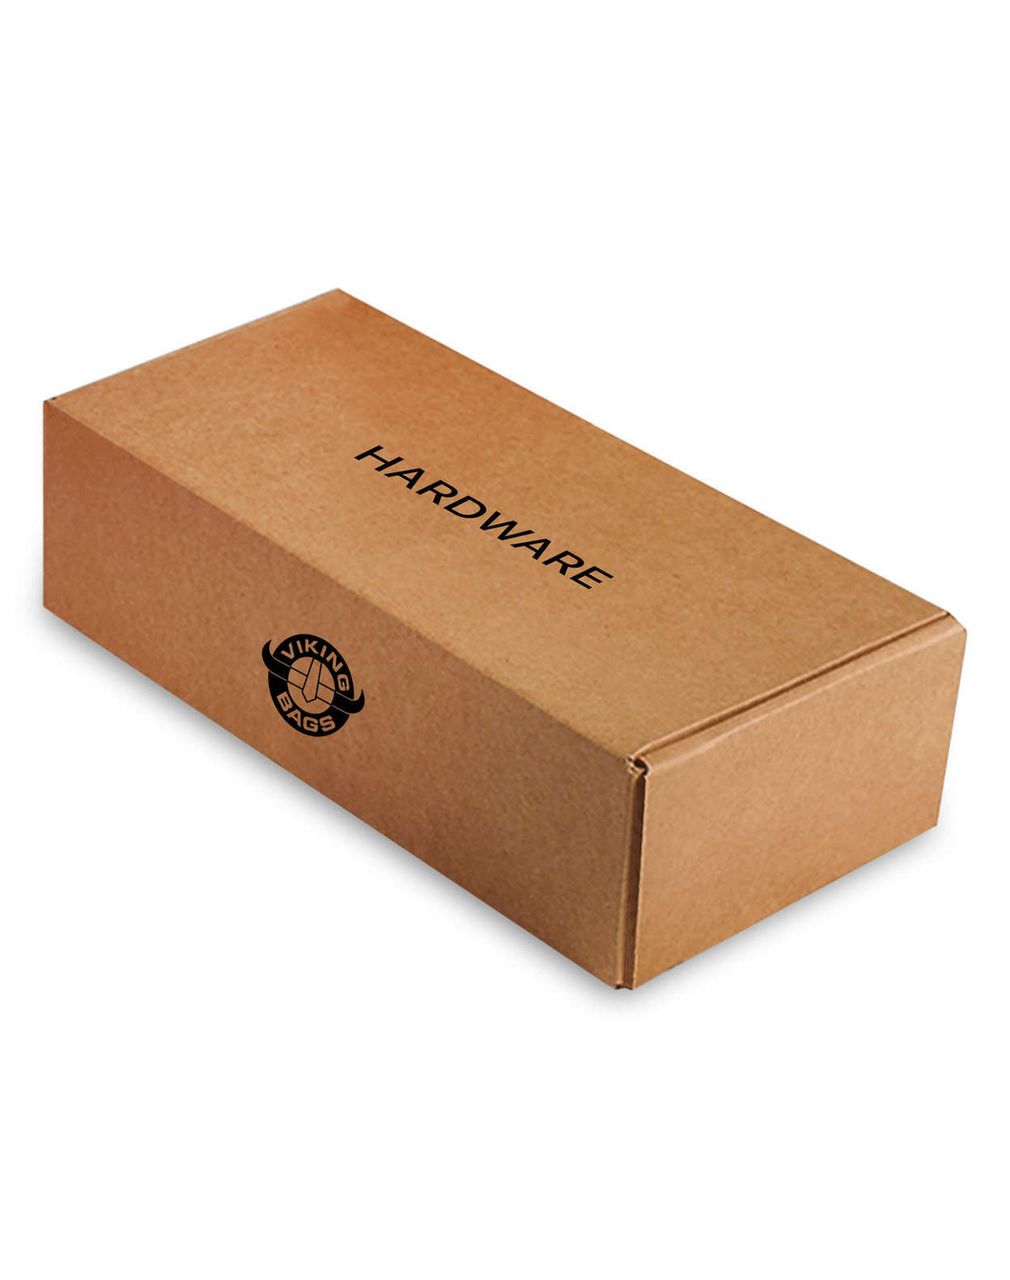 Honda 750 Shadow Phantom Medium SS Slanted Motorcycle Saddlebags box